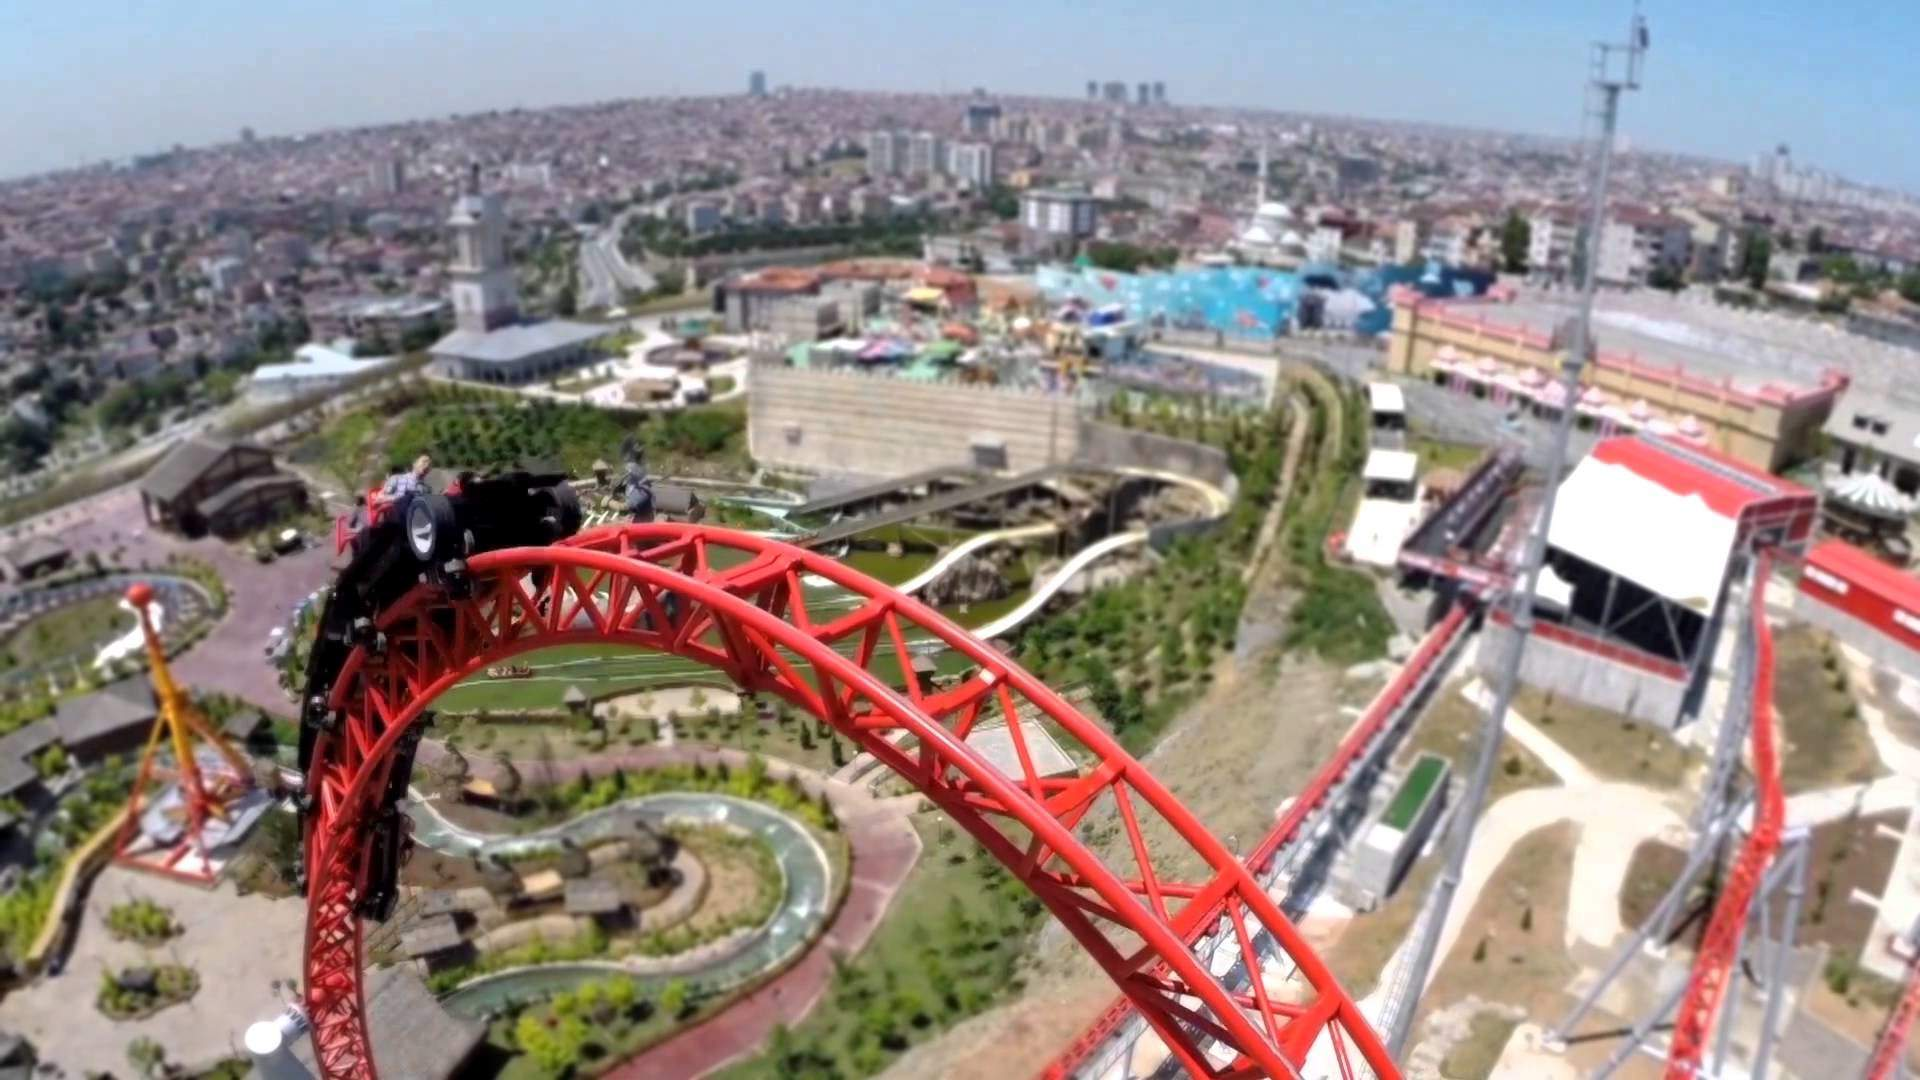 Isfanbul Vialand Theme Park - شهربازی ویالند استانبول ، ترکیه | Istanbul